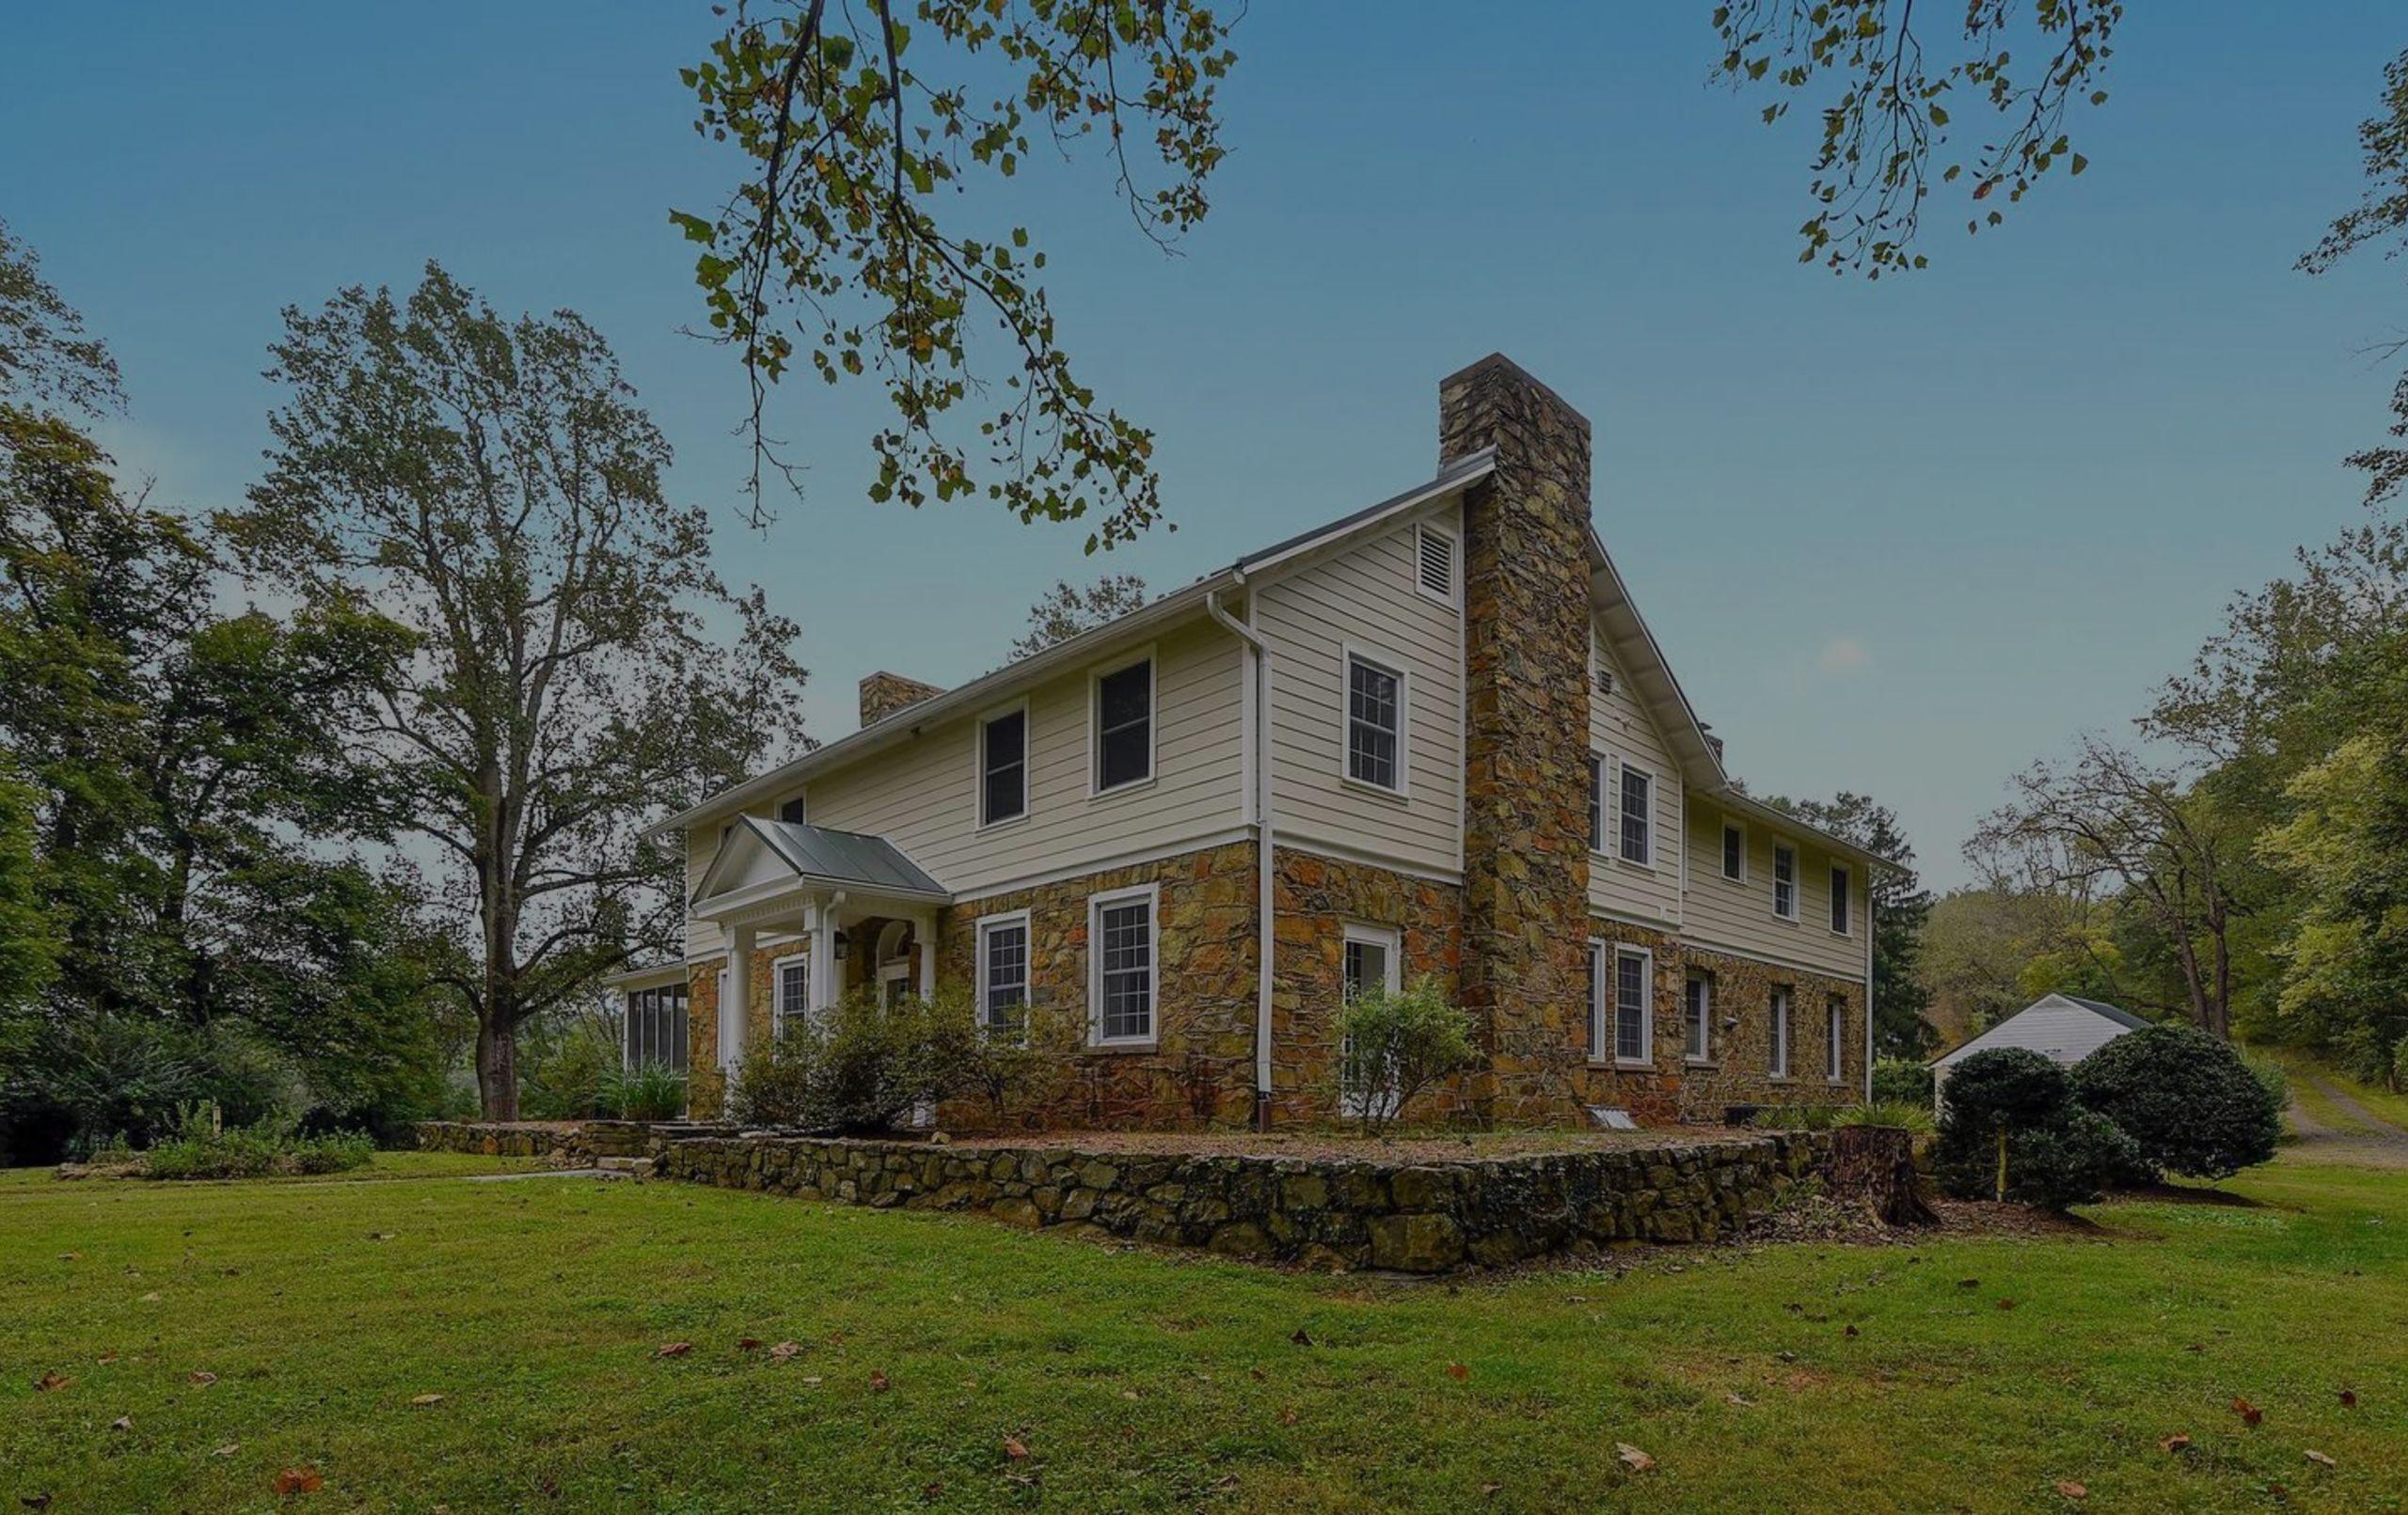 Open Houses | 4/6-7 in Loudoun, Fauquier & Fairfax